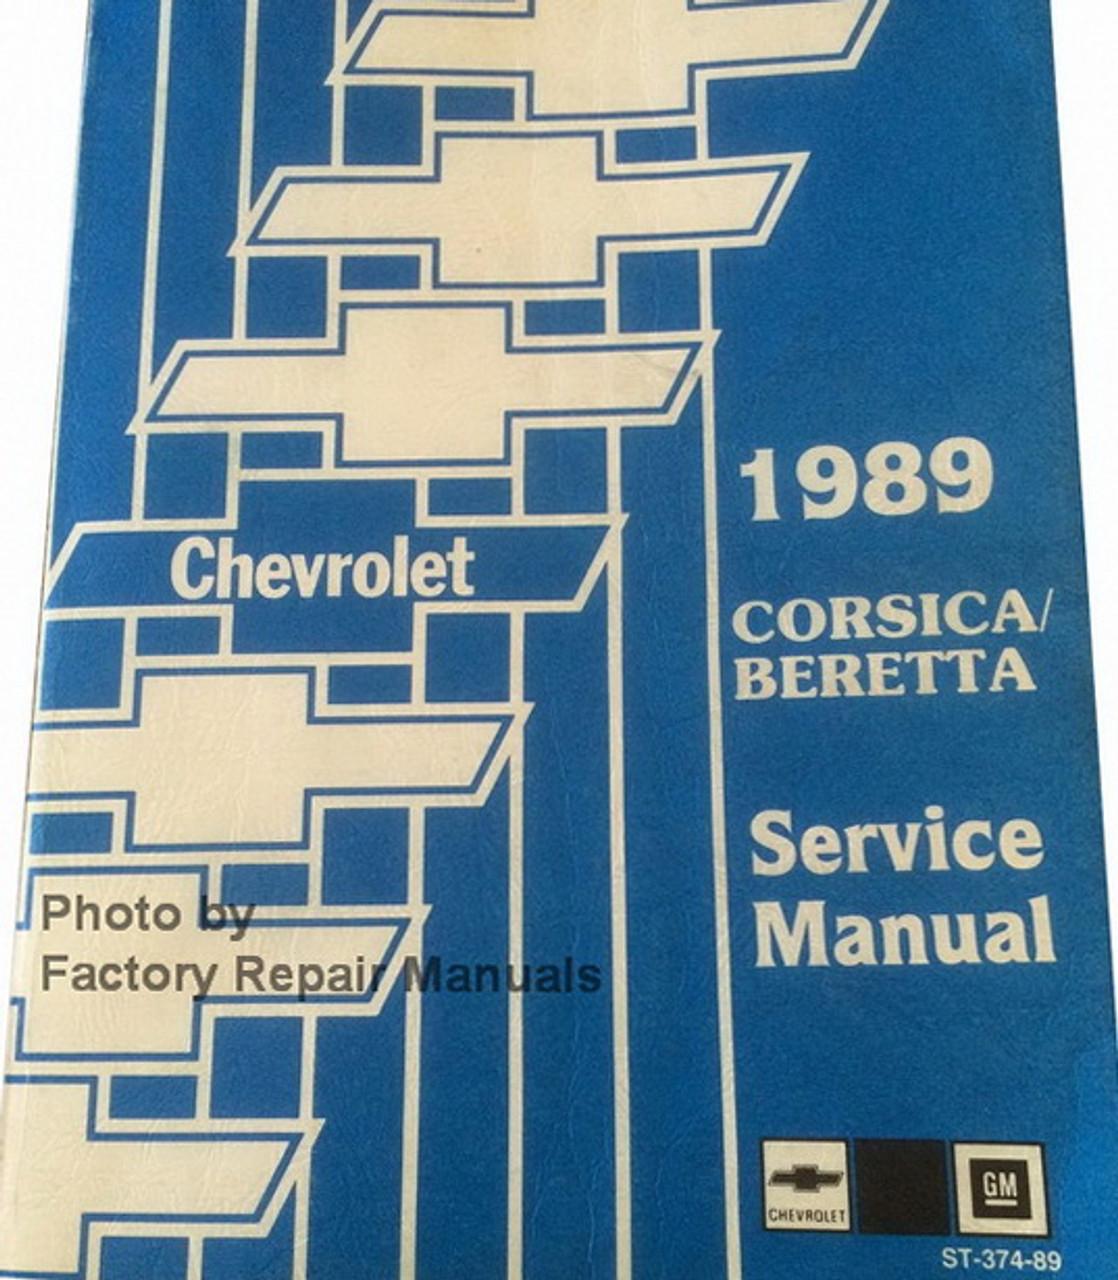 1989 Chevy Corsica and Beretta Factory Service Manual Original